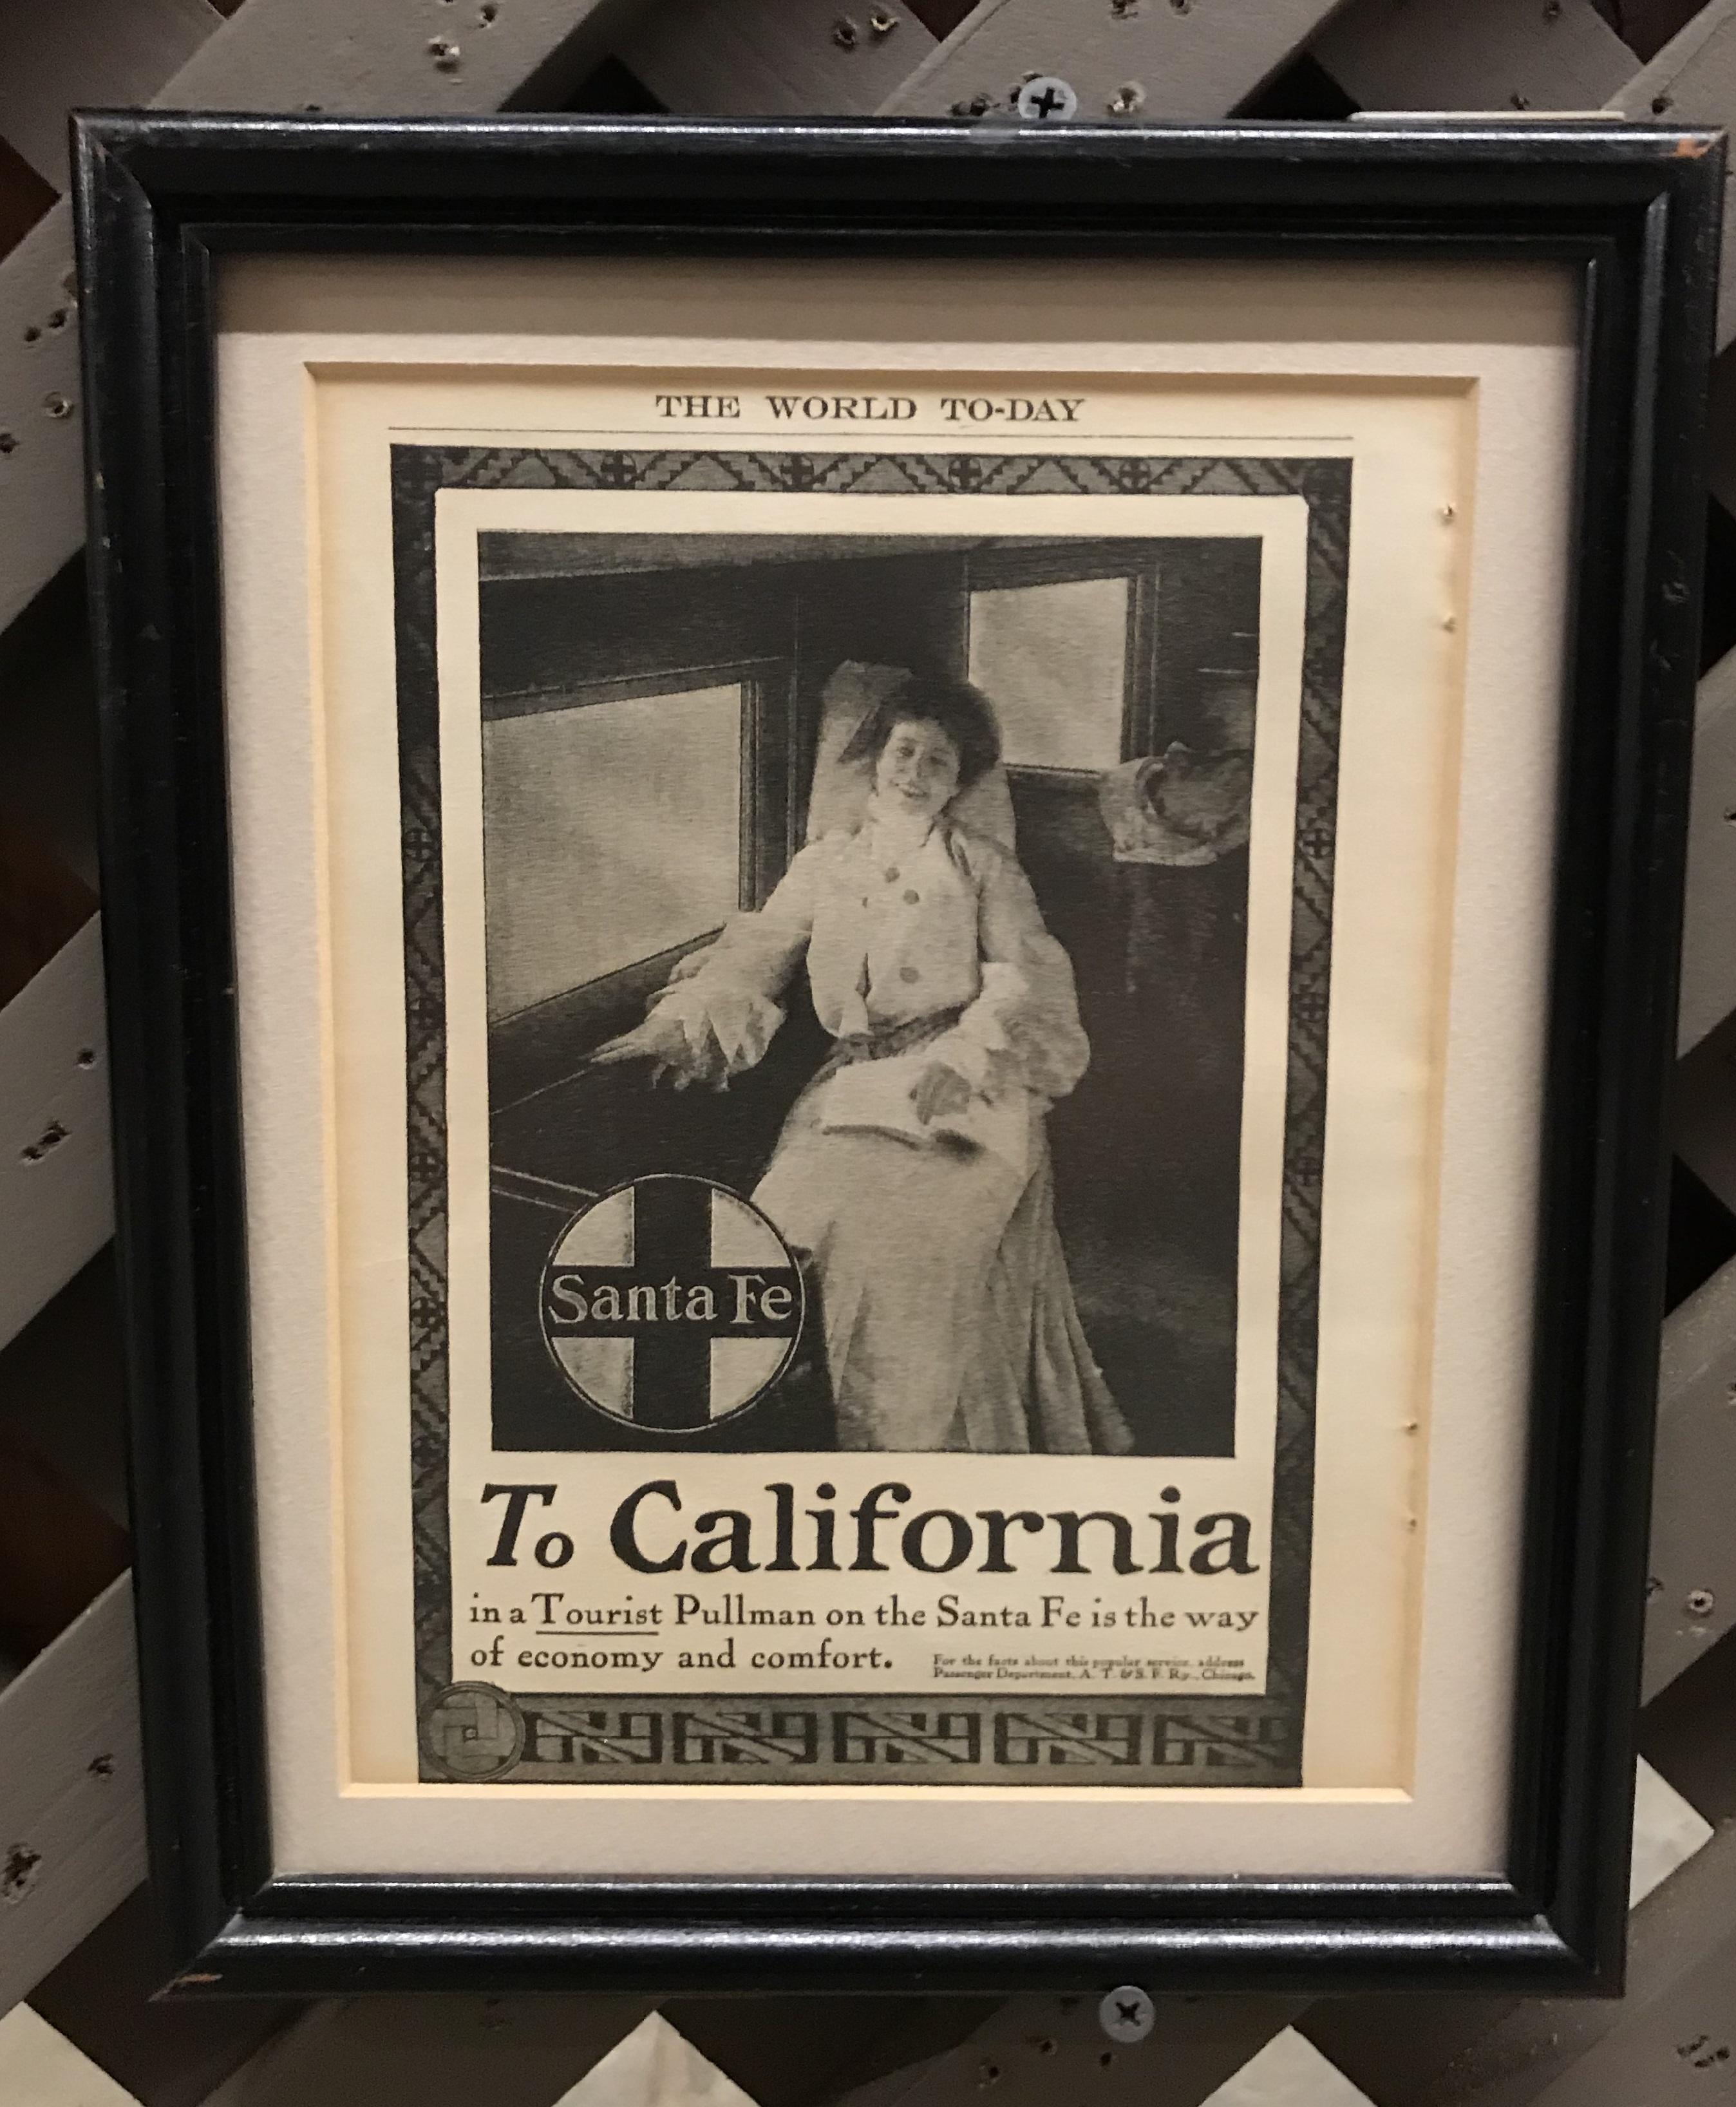 <div class='meta'><div class='origin-logo' data-origin='none'></div><span class='caption-text' data-credit='Cracker Barrel'>Cracker Barrel is giving restaurant patrons a sneak peek inside its first California restaurant, which is set to open in Victorville Feb. 5.</span></div>